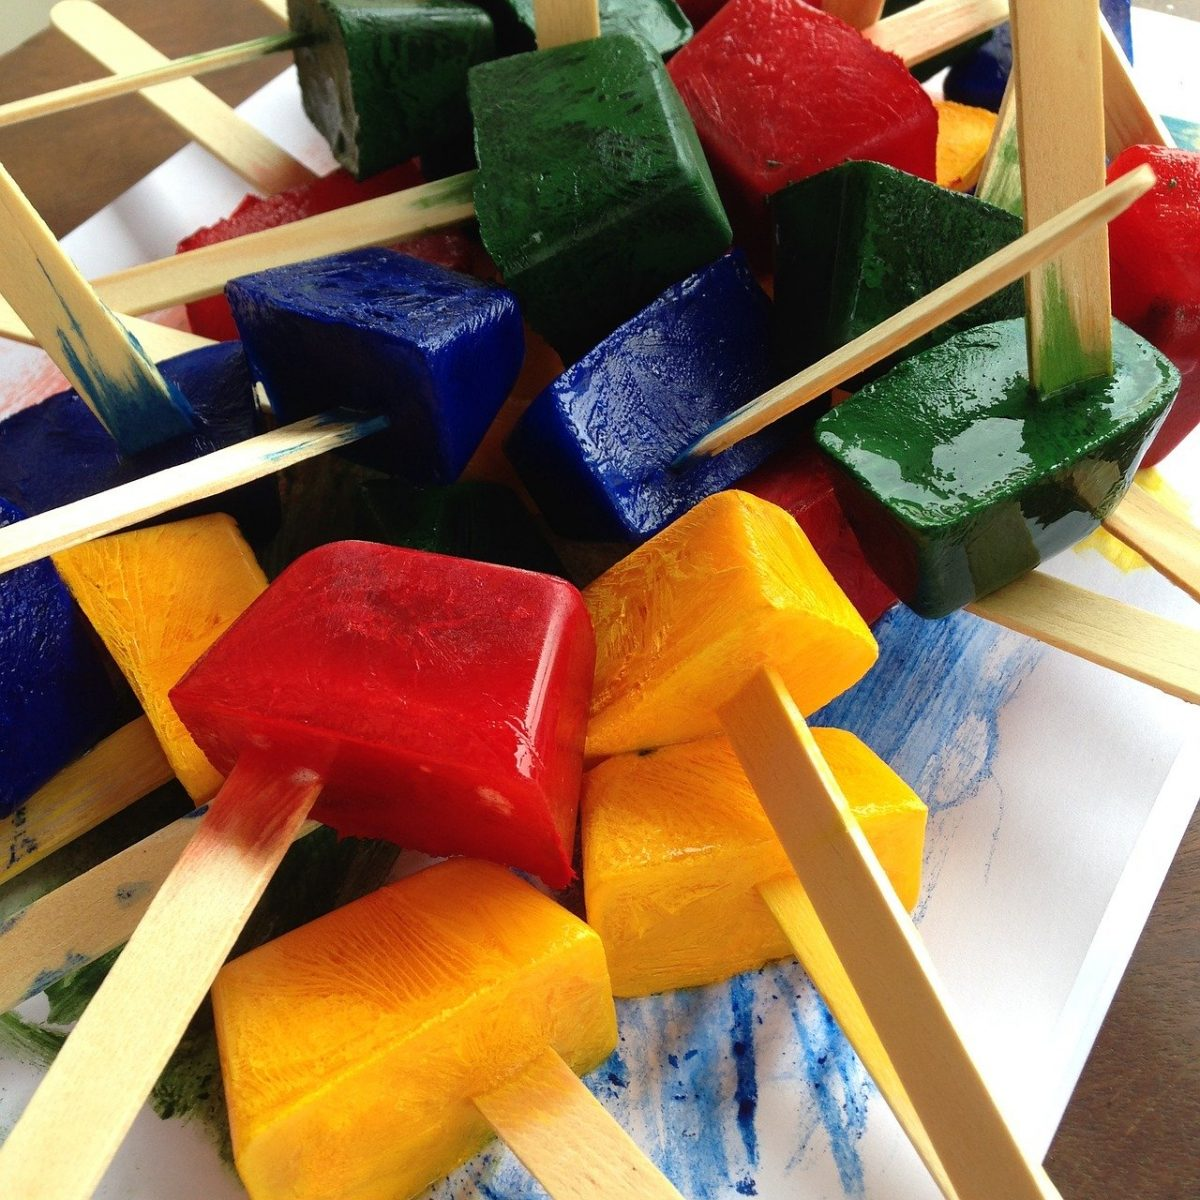 popsicles-735607_1280